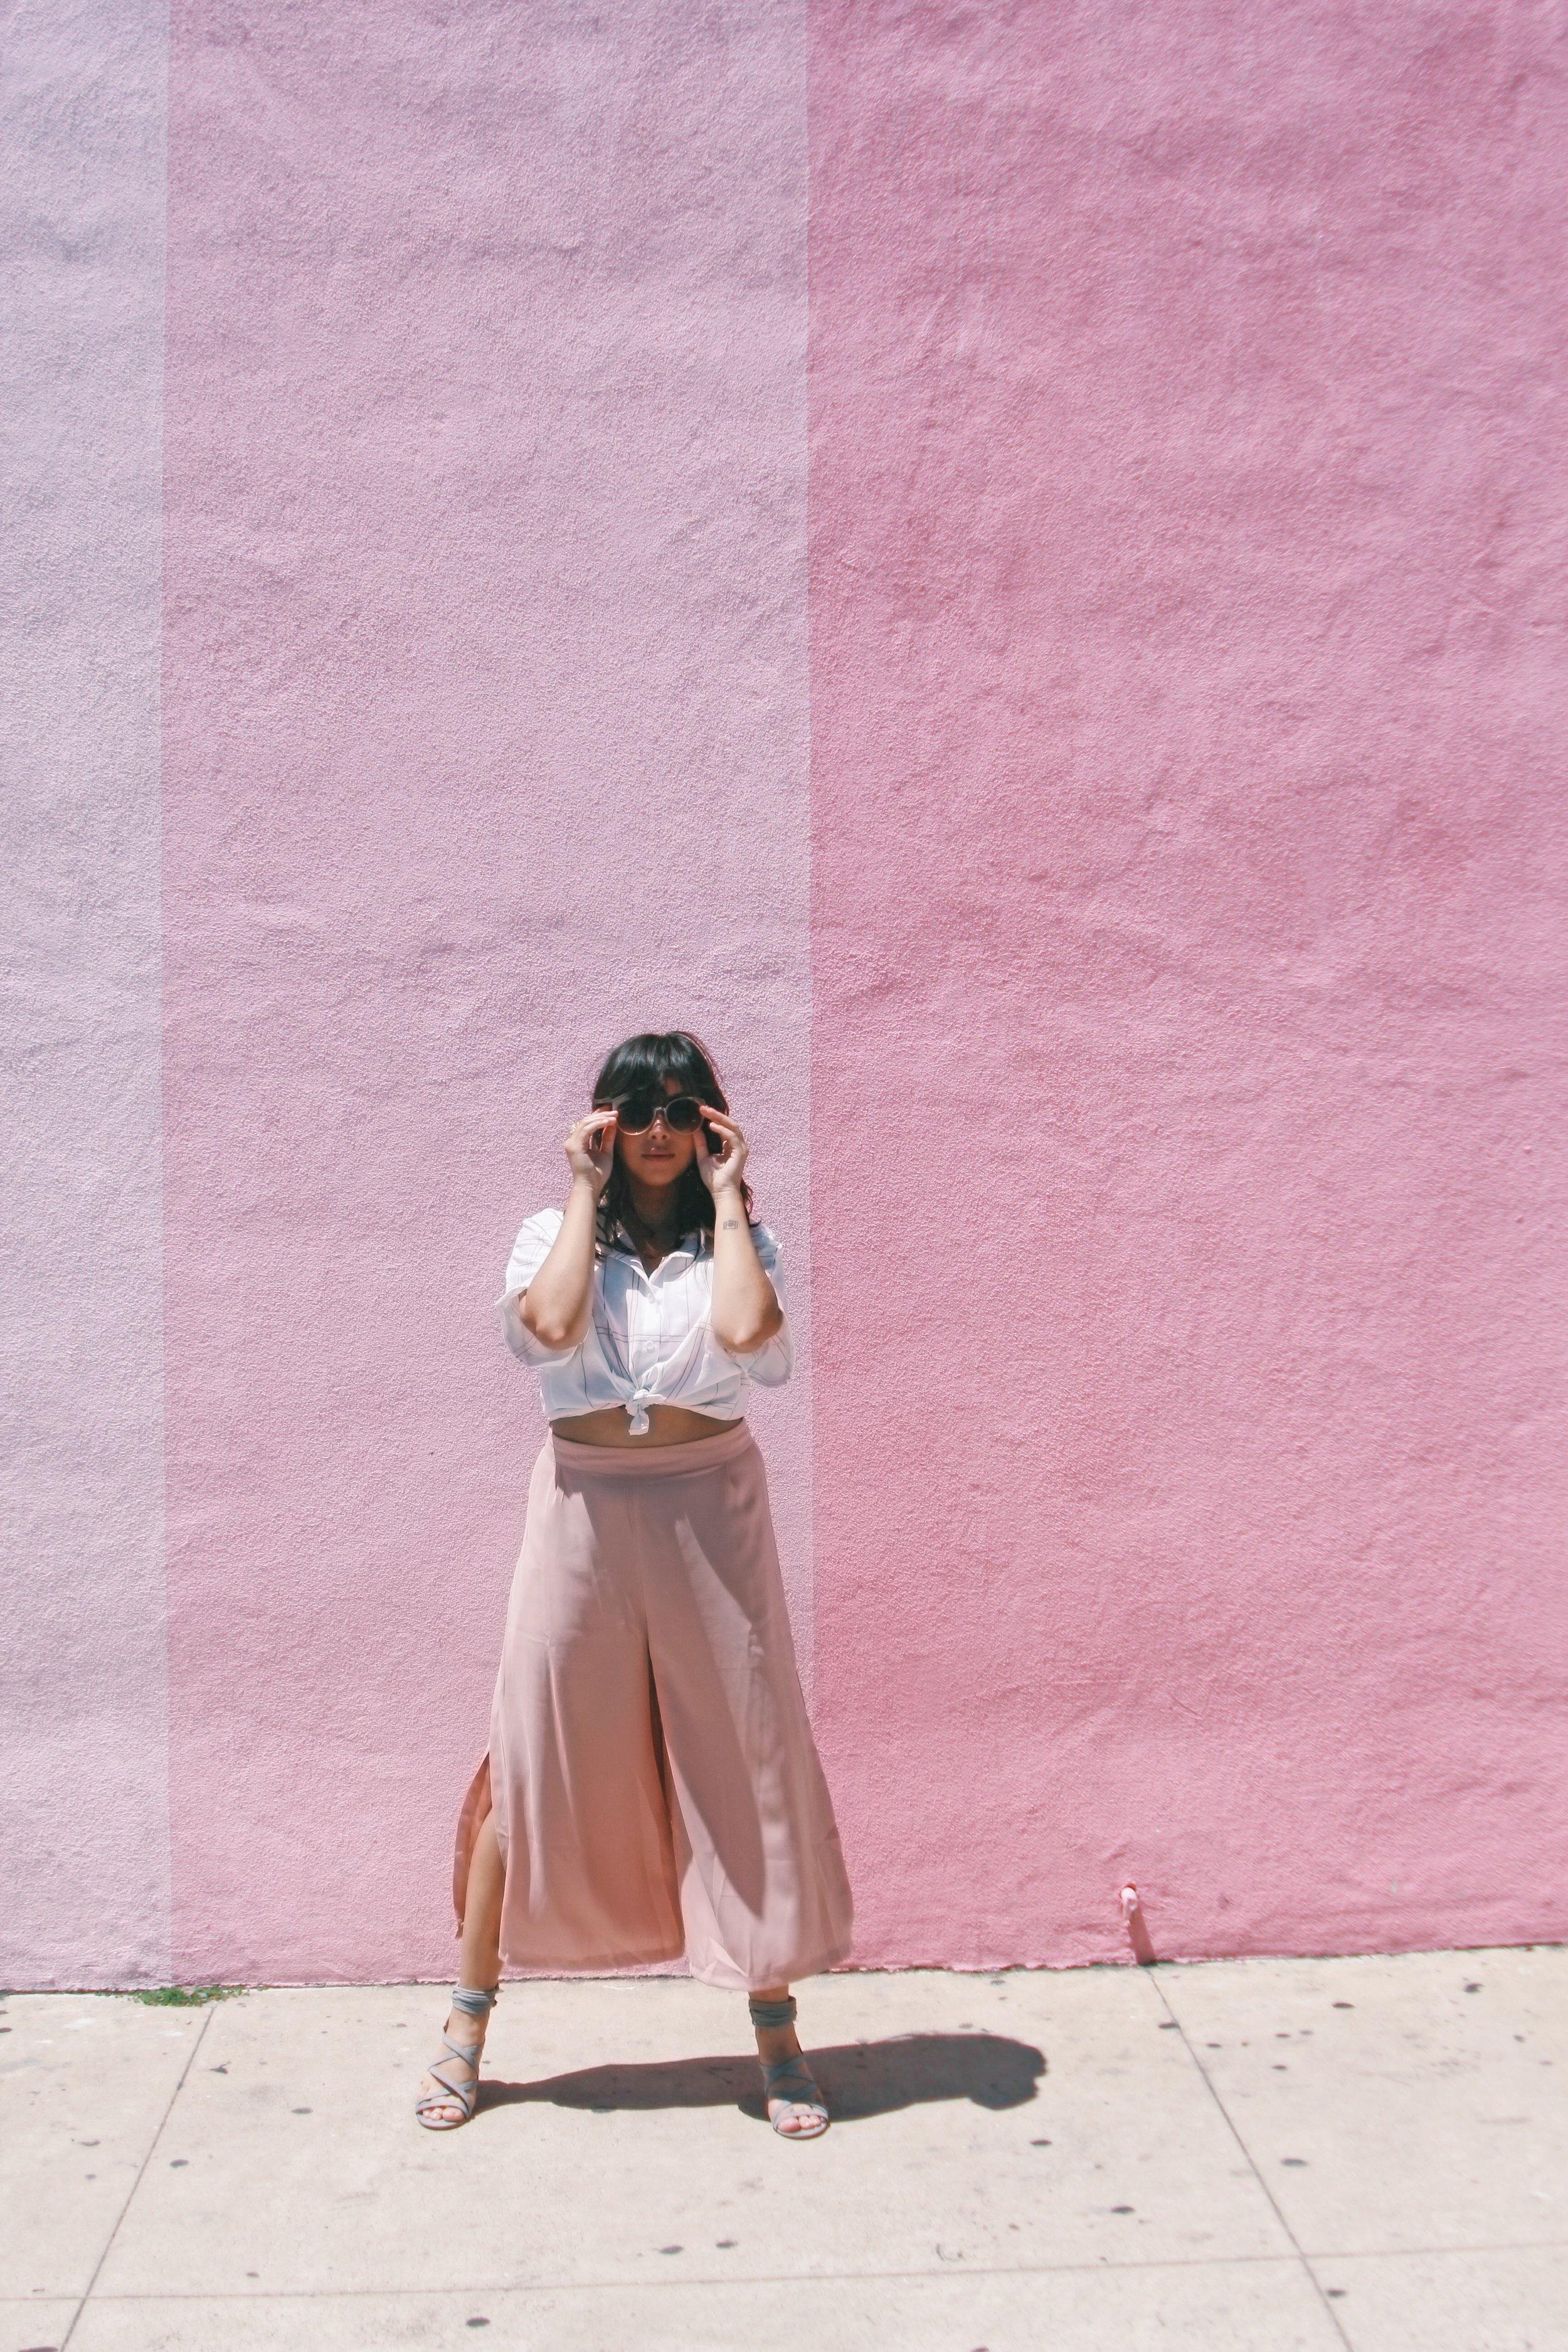 Shirt:  SheIn Culottes:  Graffiti Beach Boutique  Shoes:  Shoe Dazzle